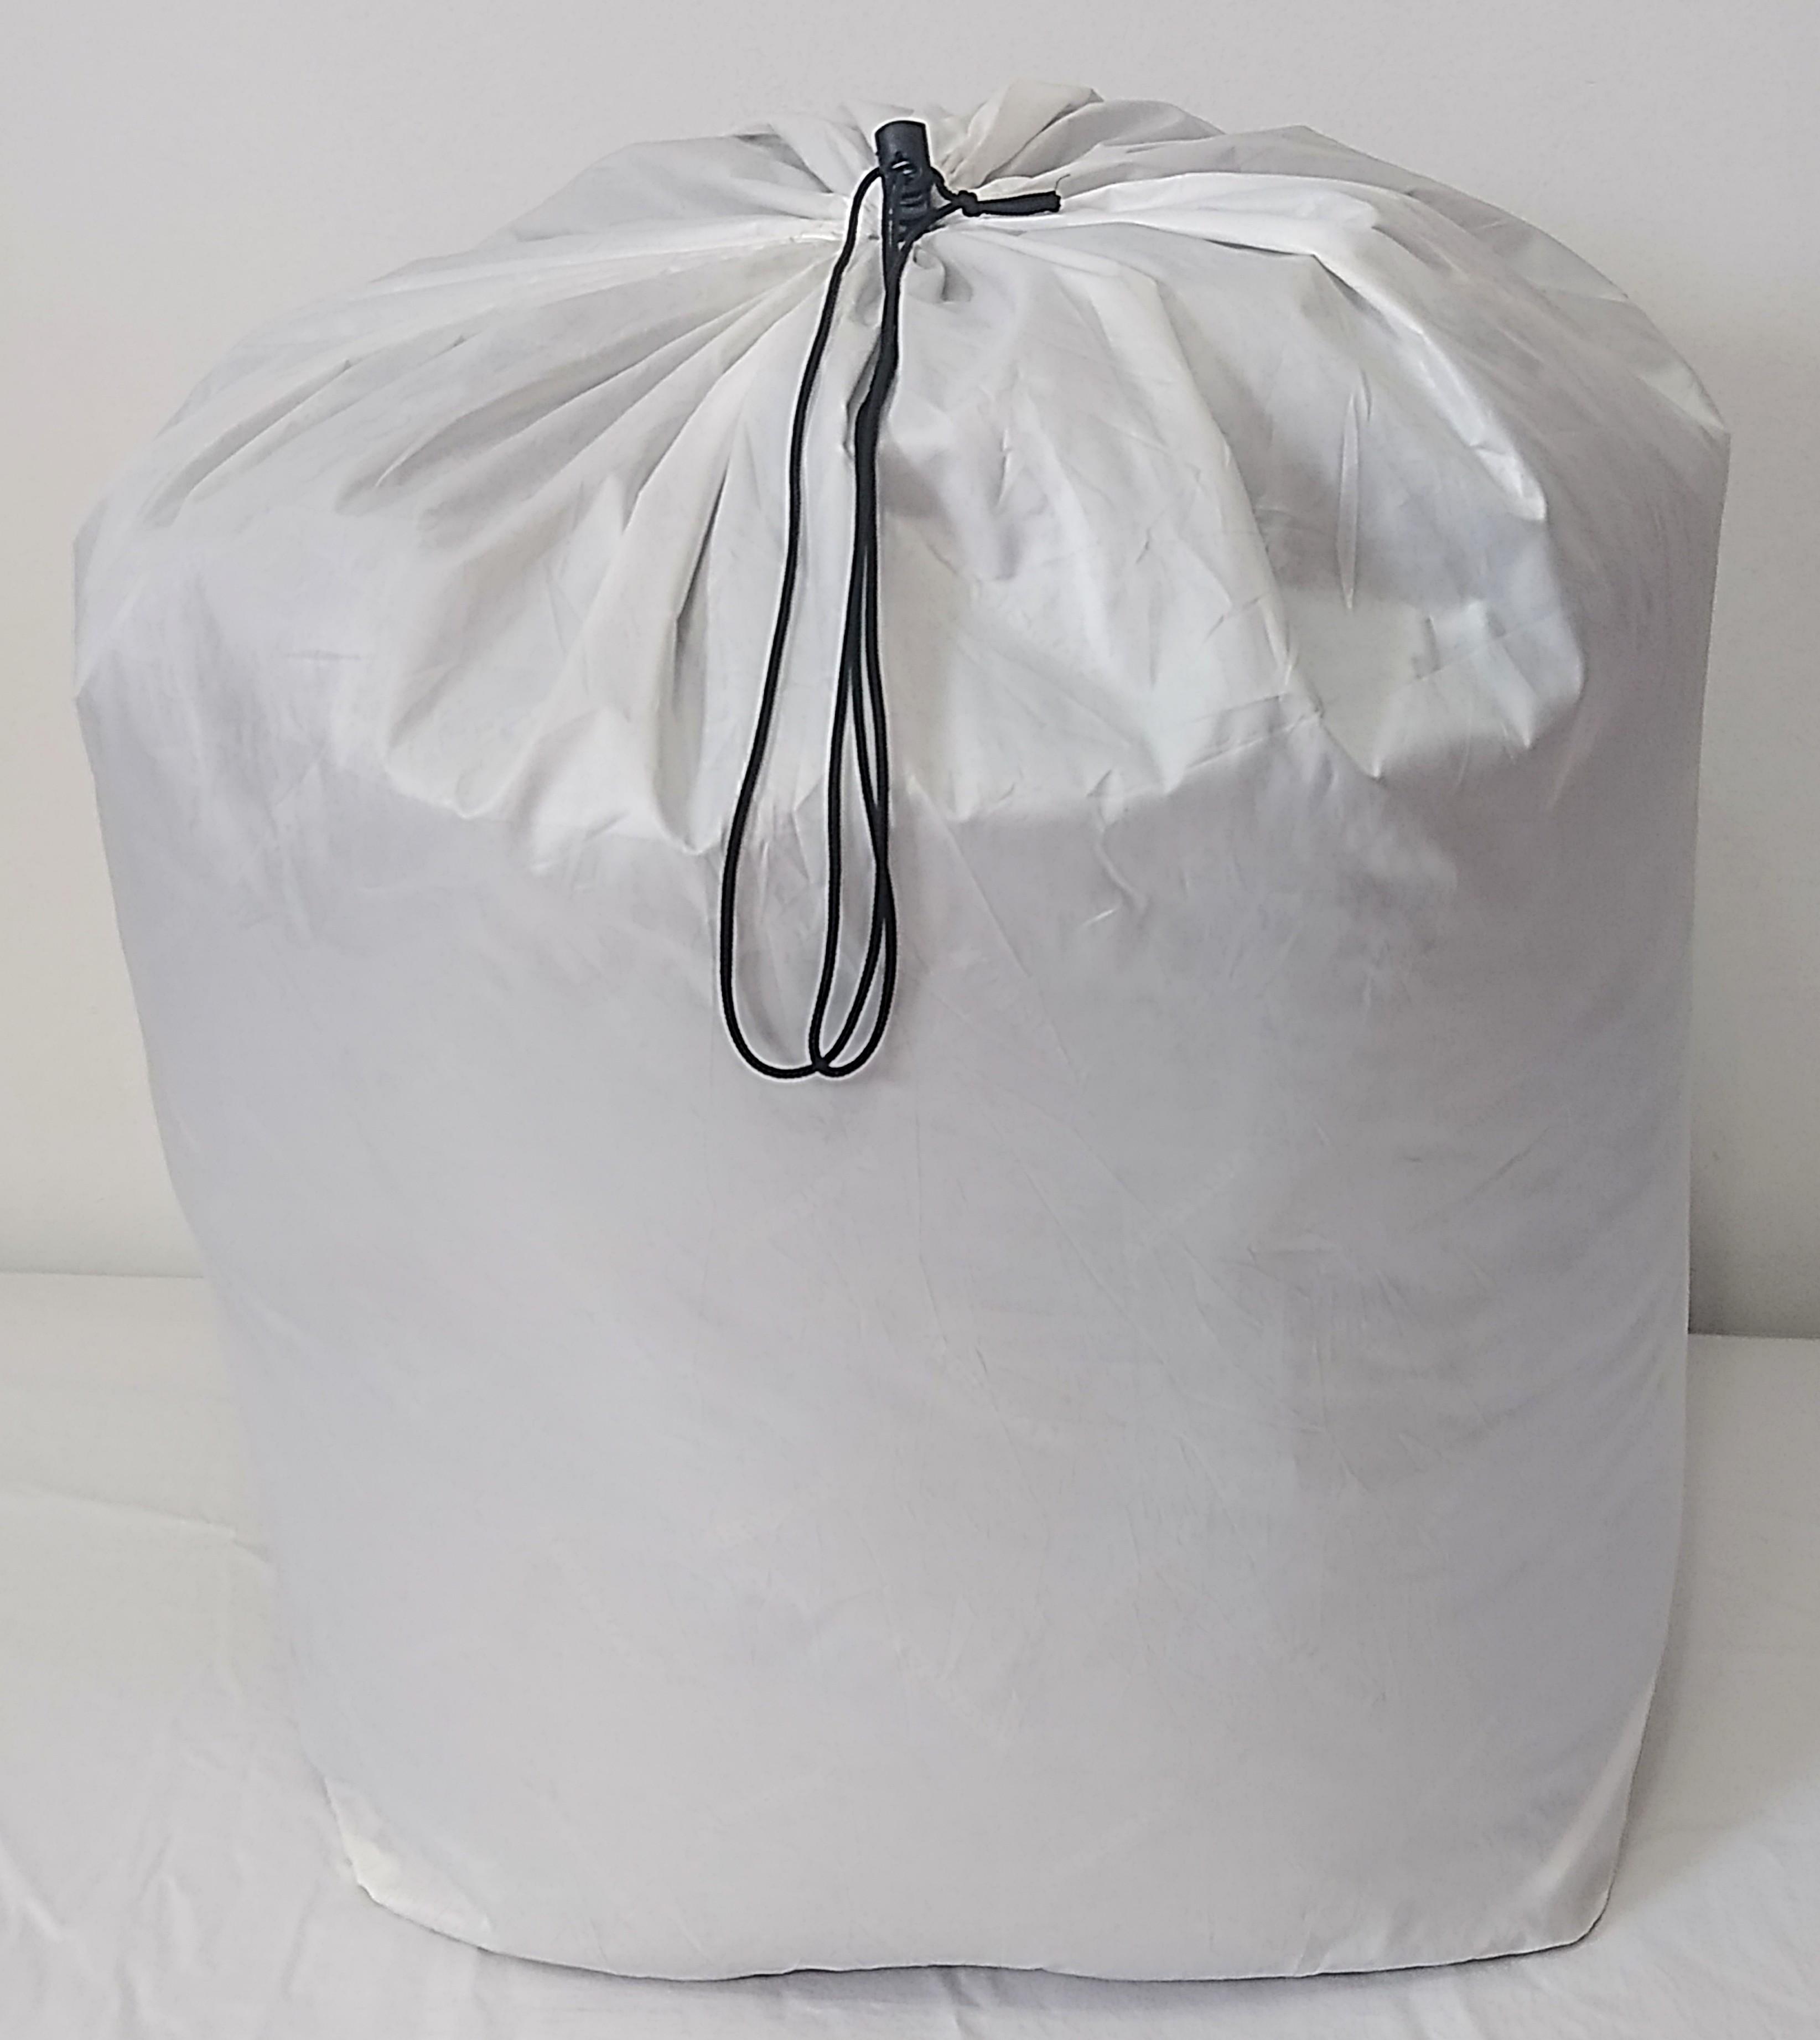 saco de armazenamento